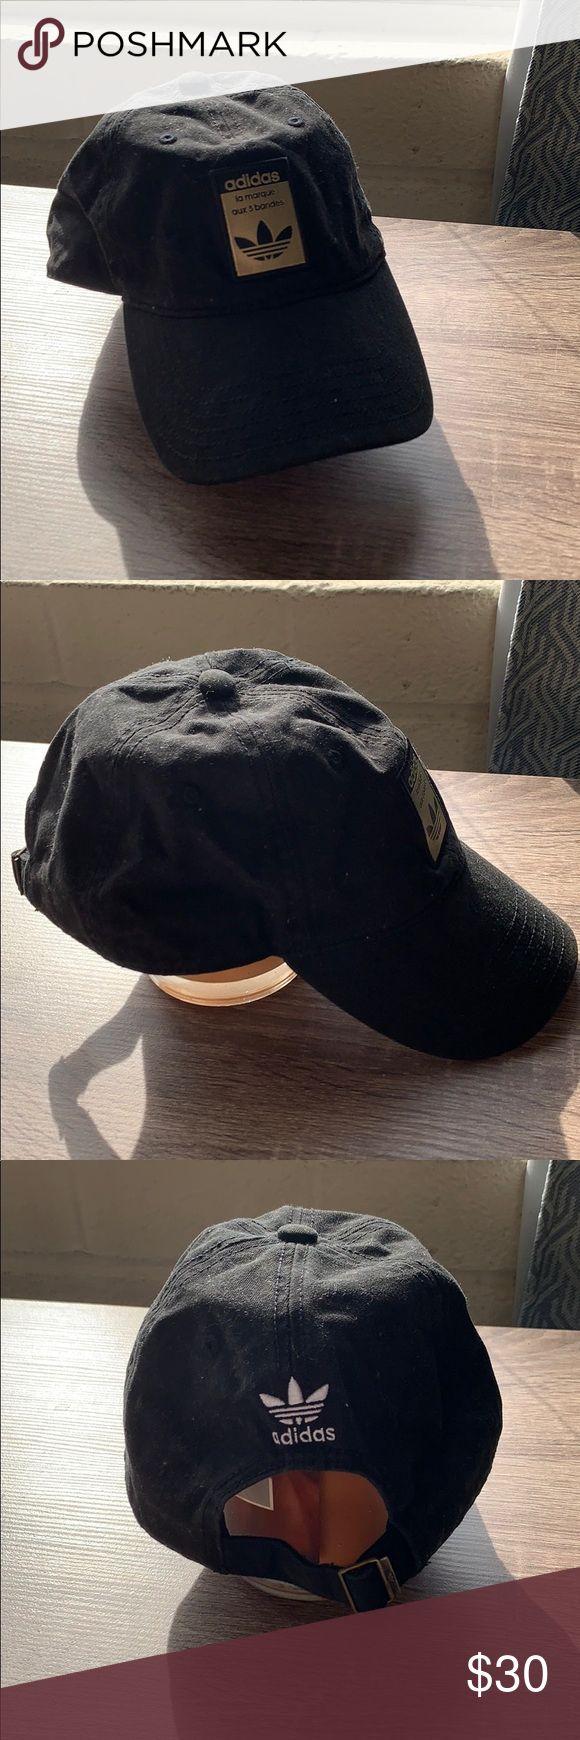 Black and gold adidas cap Adidas cap, Gold adidas, Hat